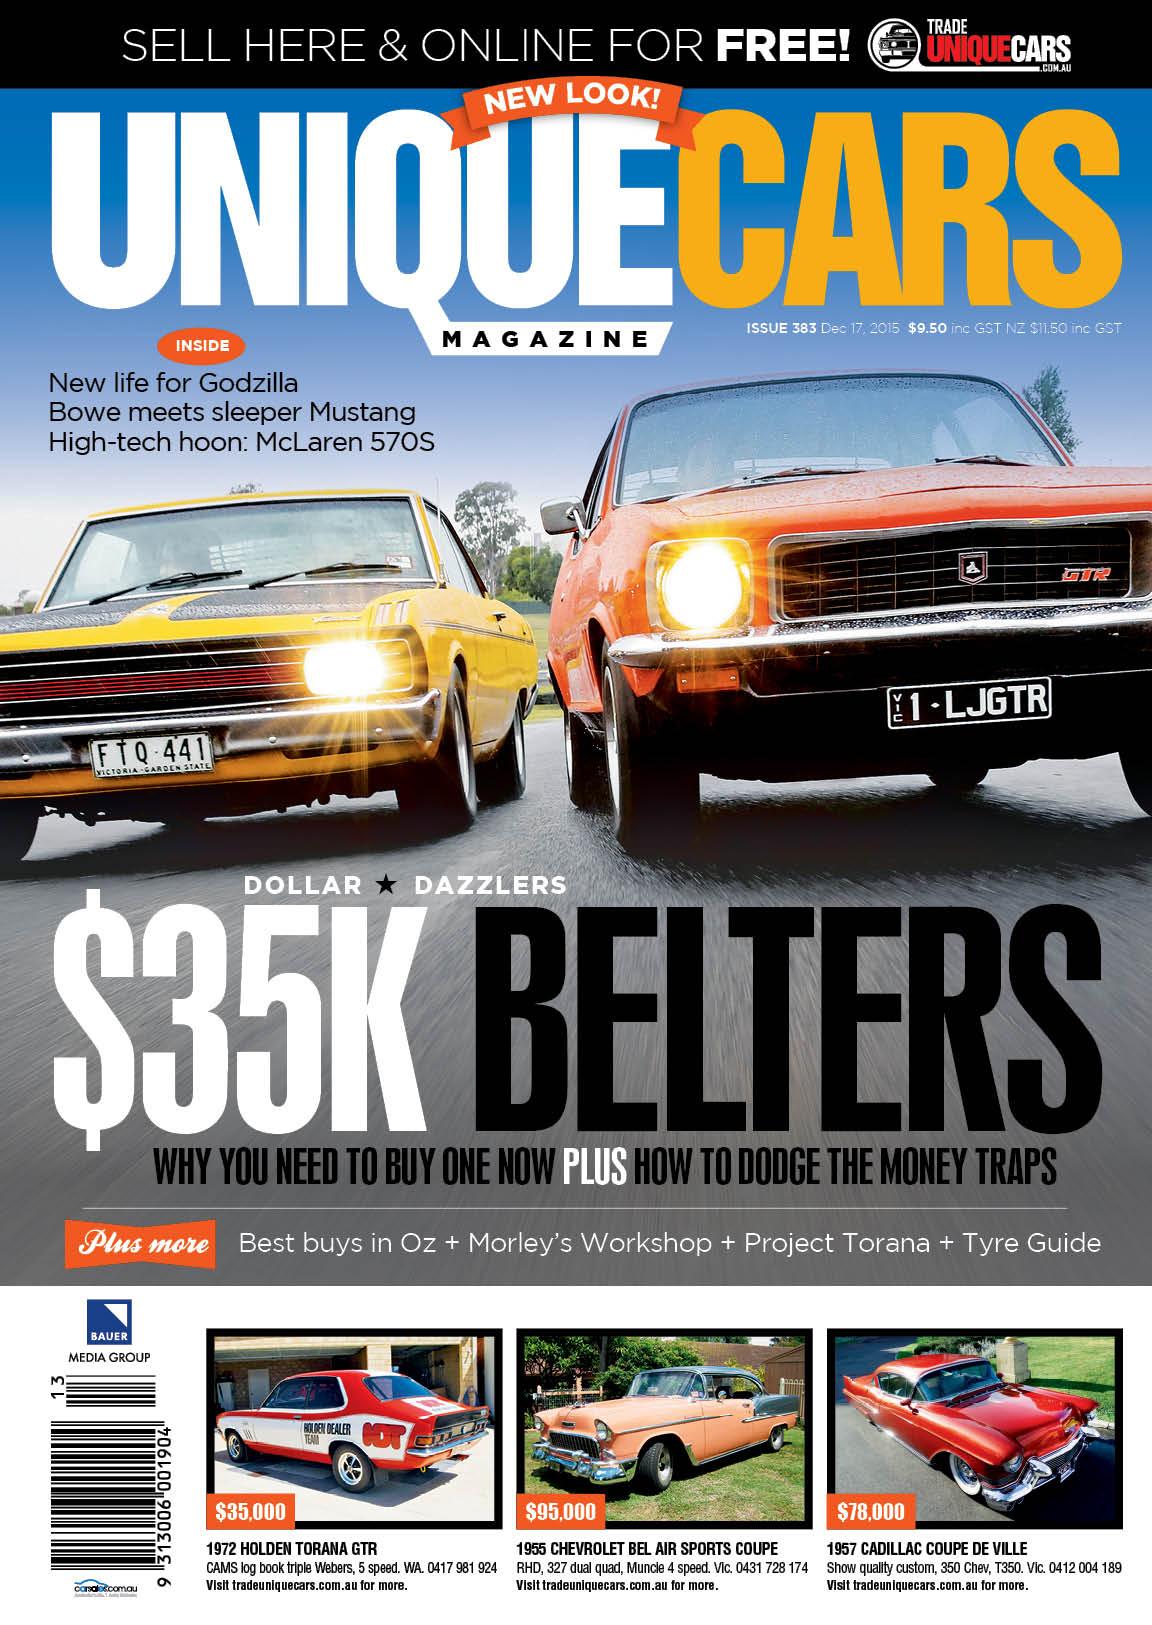 Funky Unique Cars.com.au Photos - Classic Cars Ideas - boiq.info